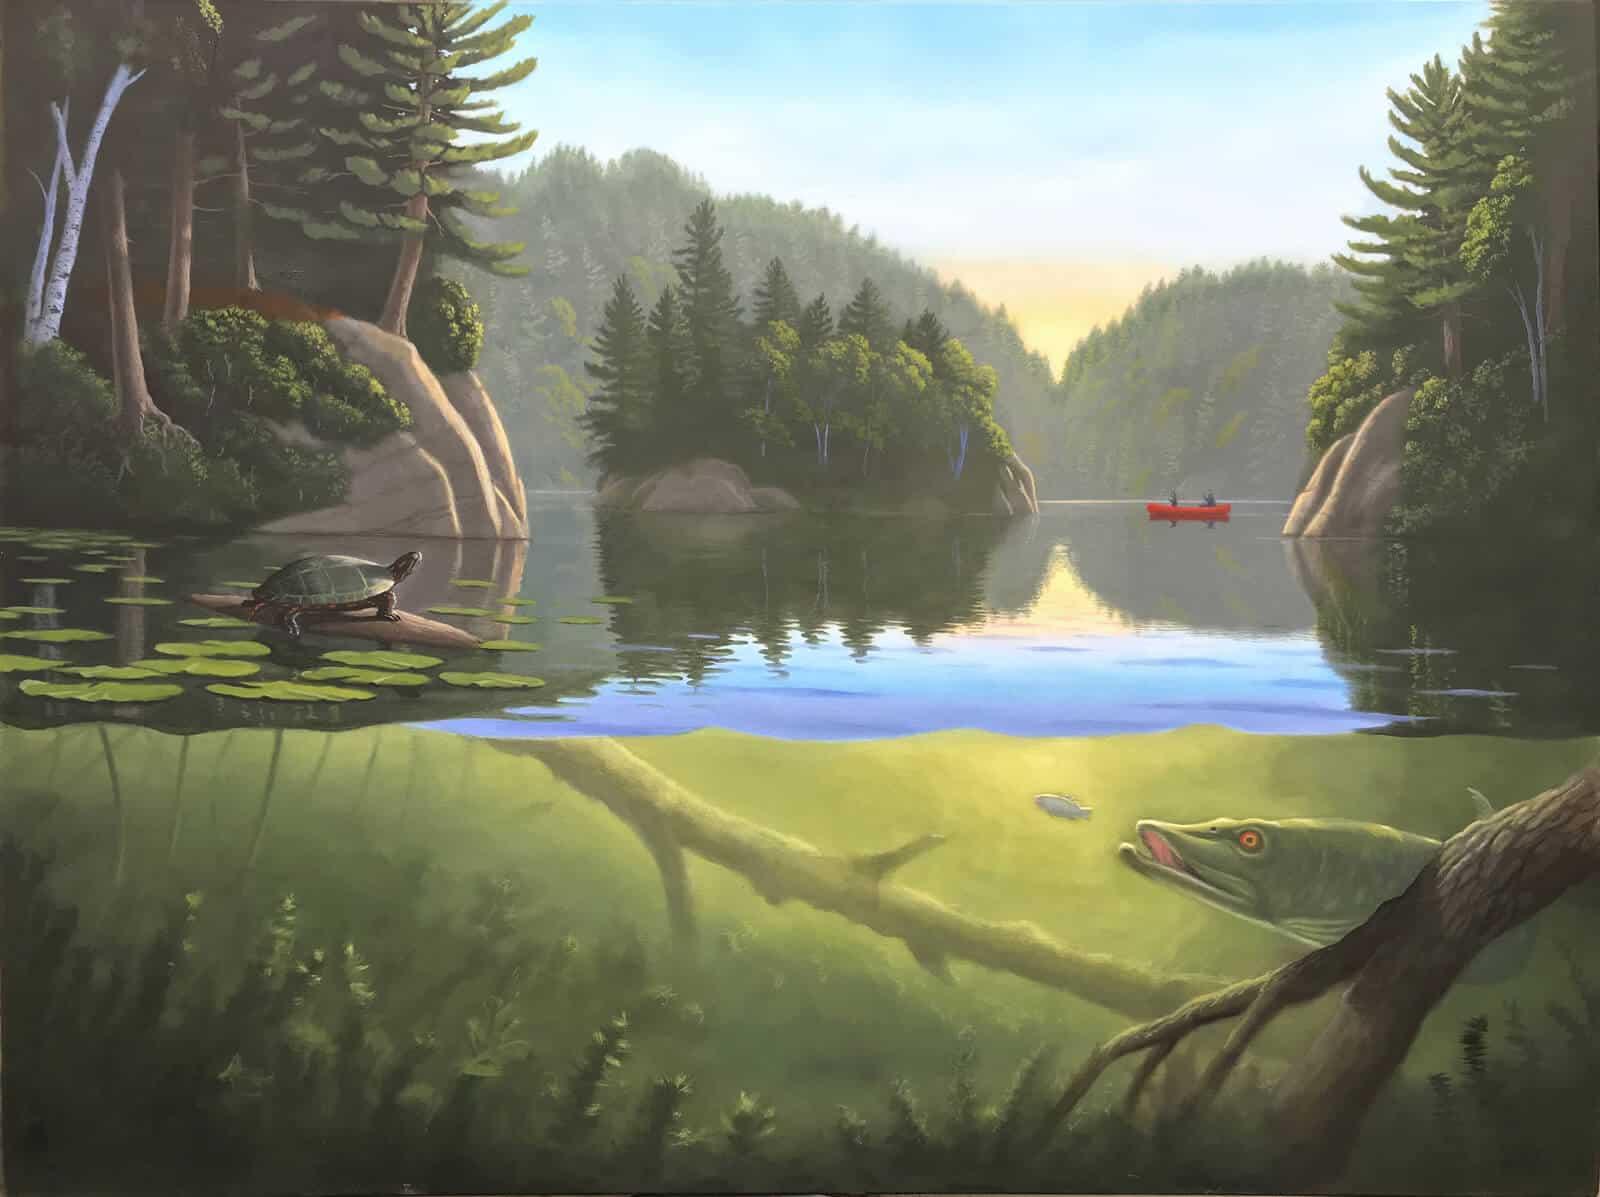 Original Oil Painting of Muskoka lake and wilderness by artist Robert Johnson